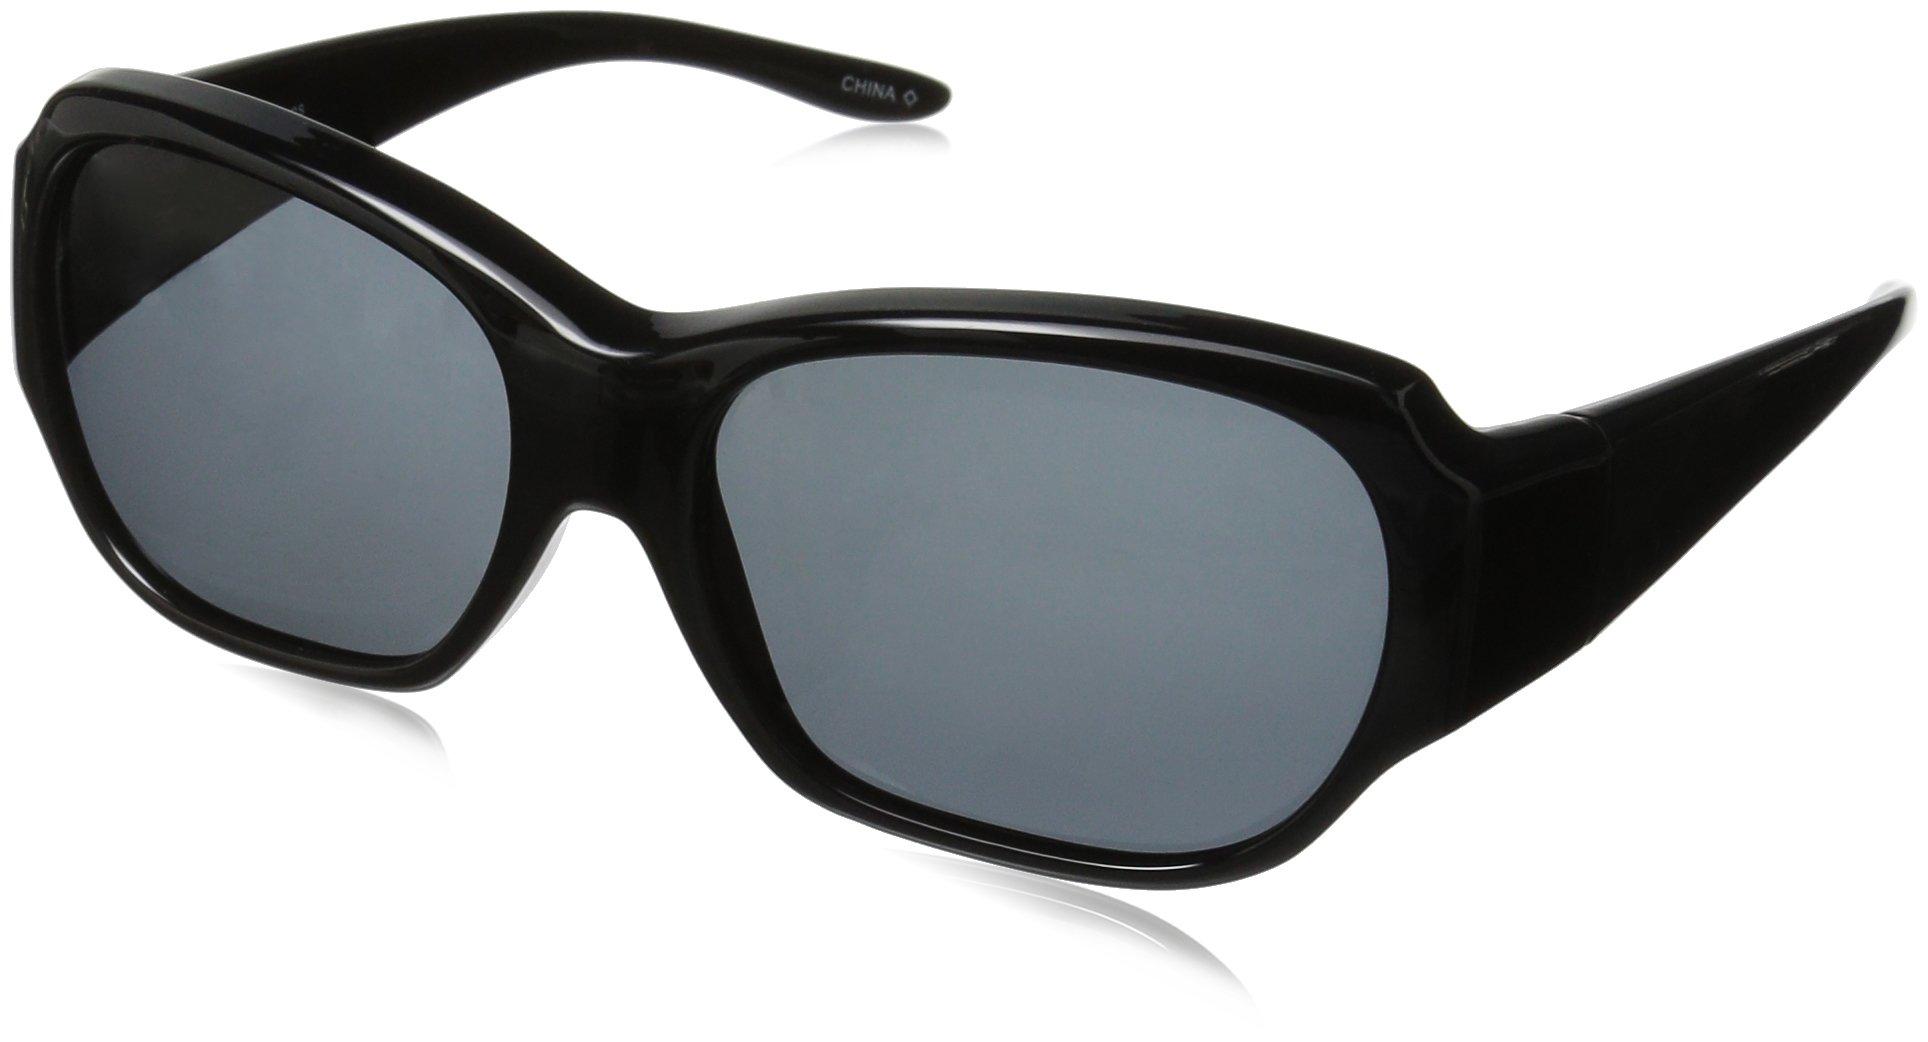 Solar Shield Santa Monica Polarized Rectangular Sunglasses, Black, 59 mm